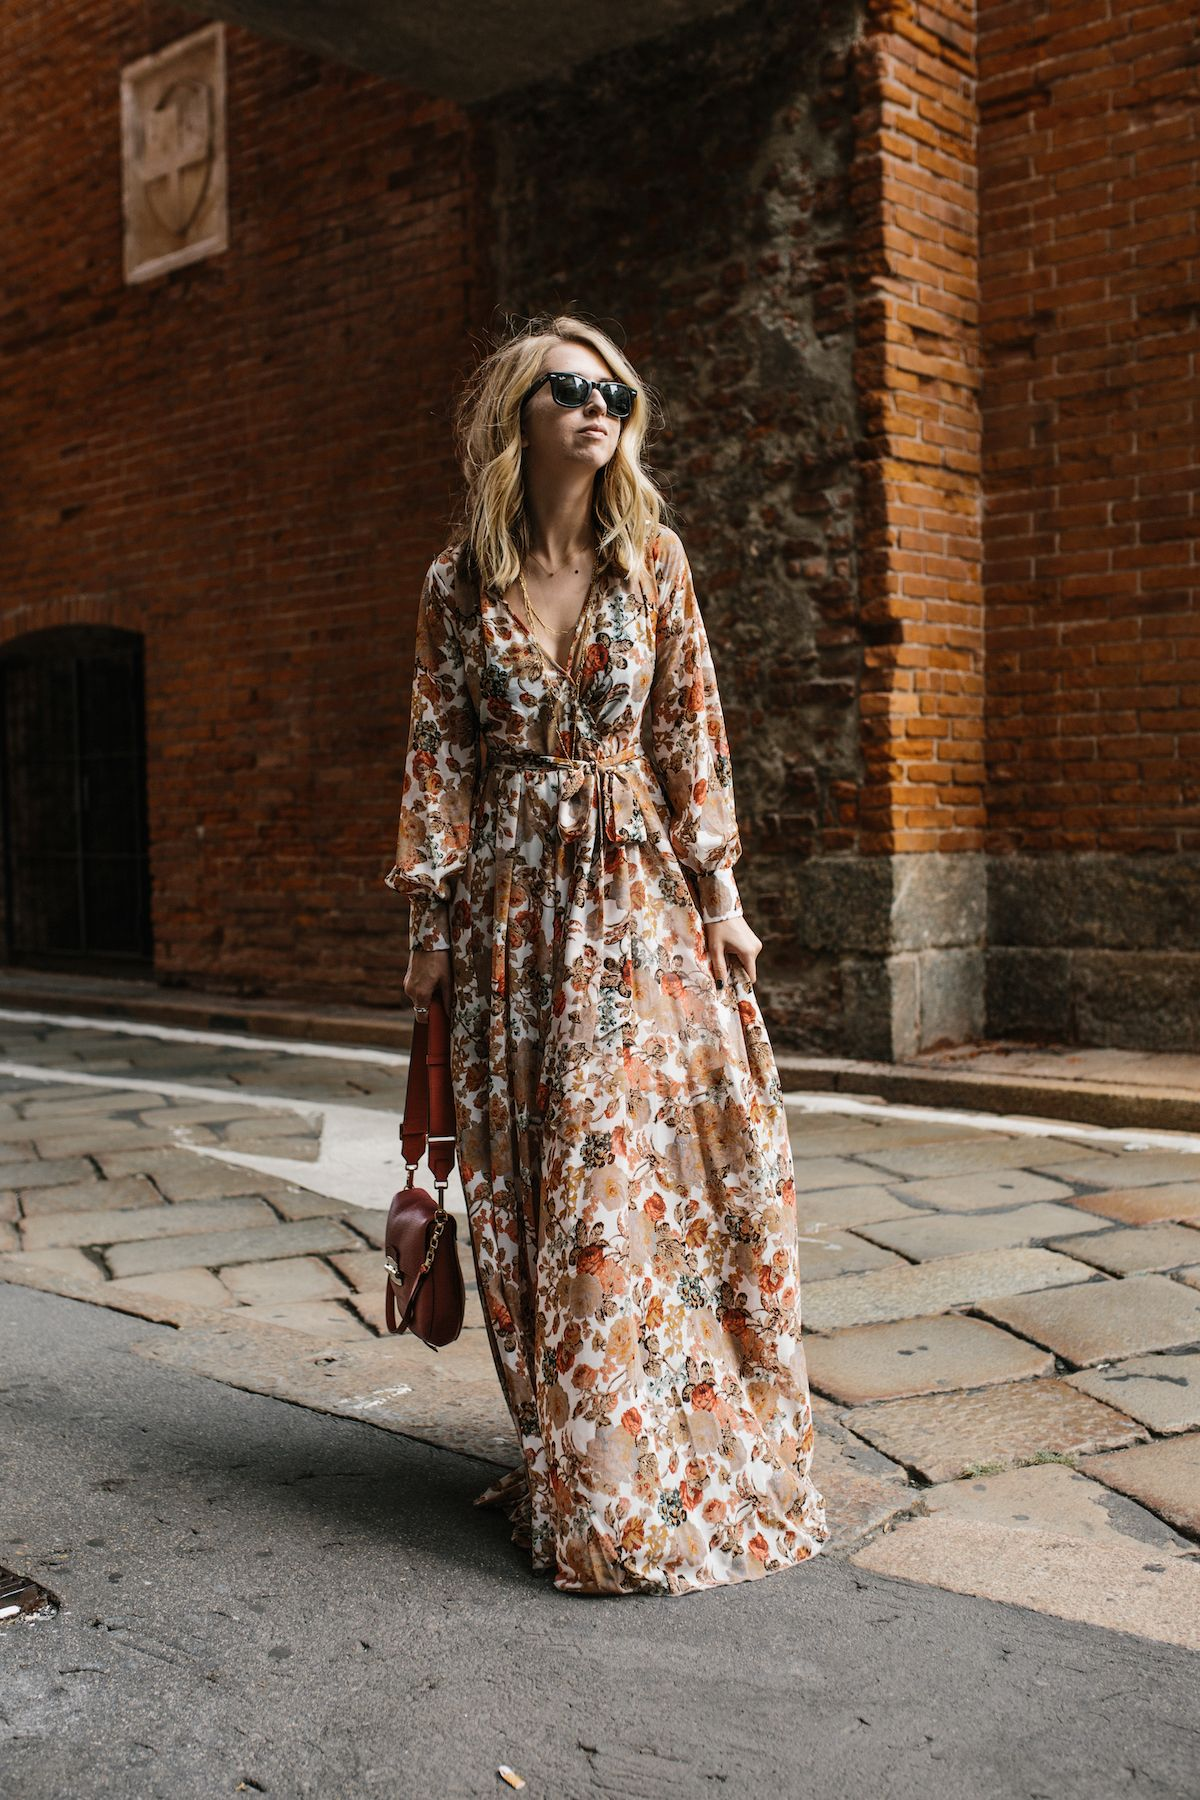 Milan Italy Maxi Dress Fashion Boho Fashion [ 1800 x 1200 Pixel ]